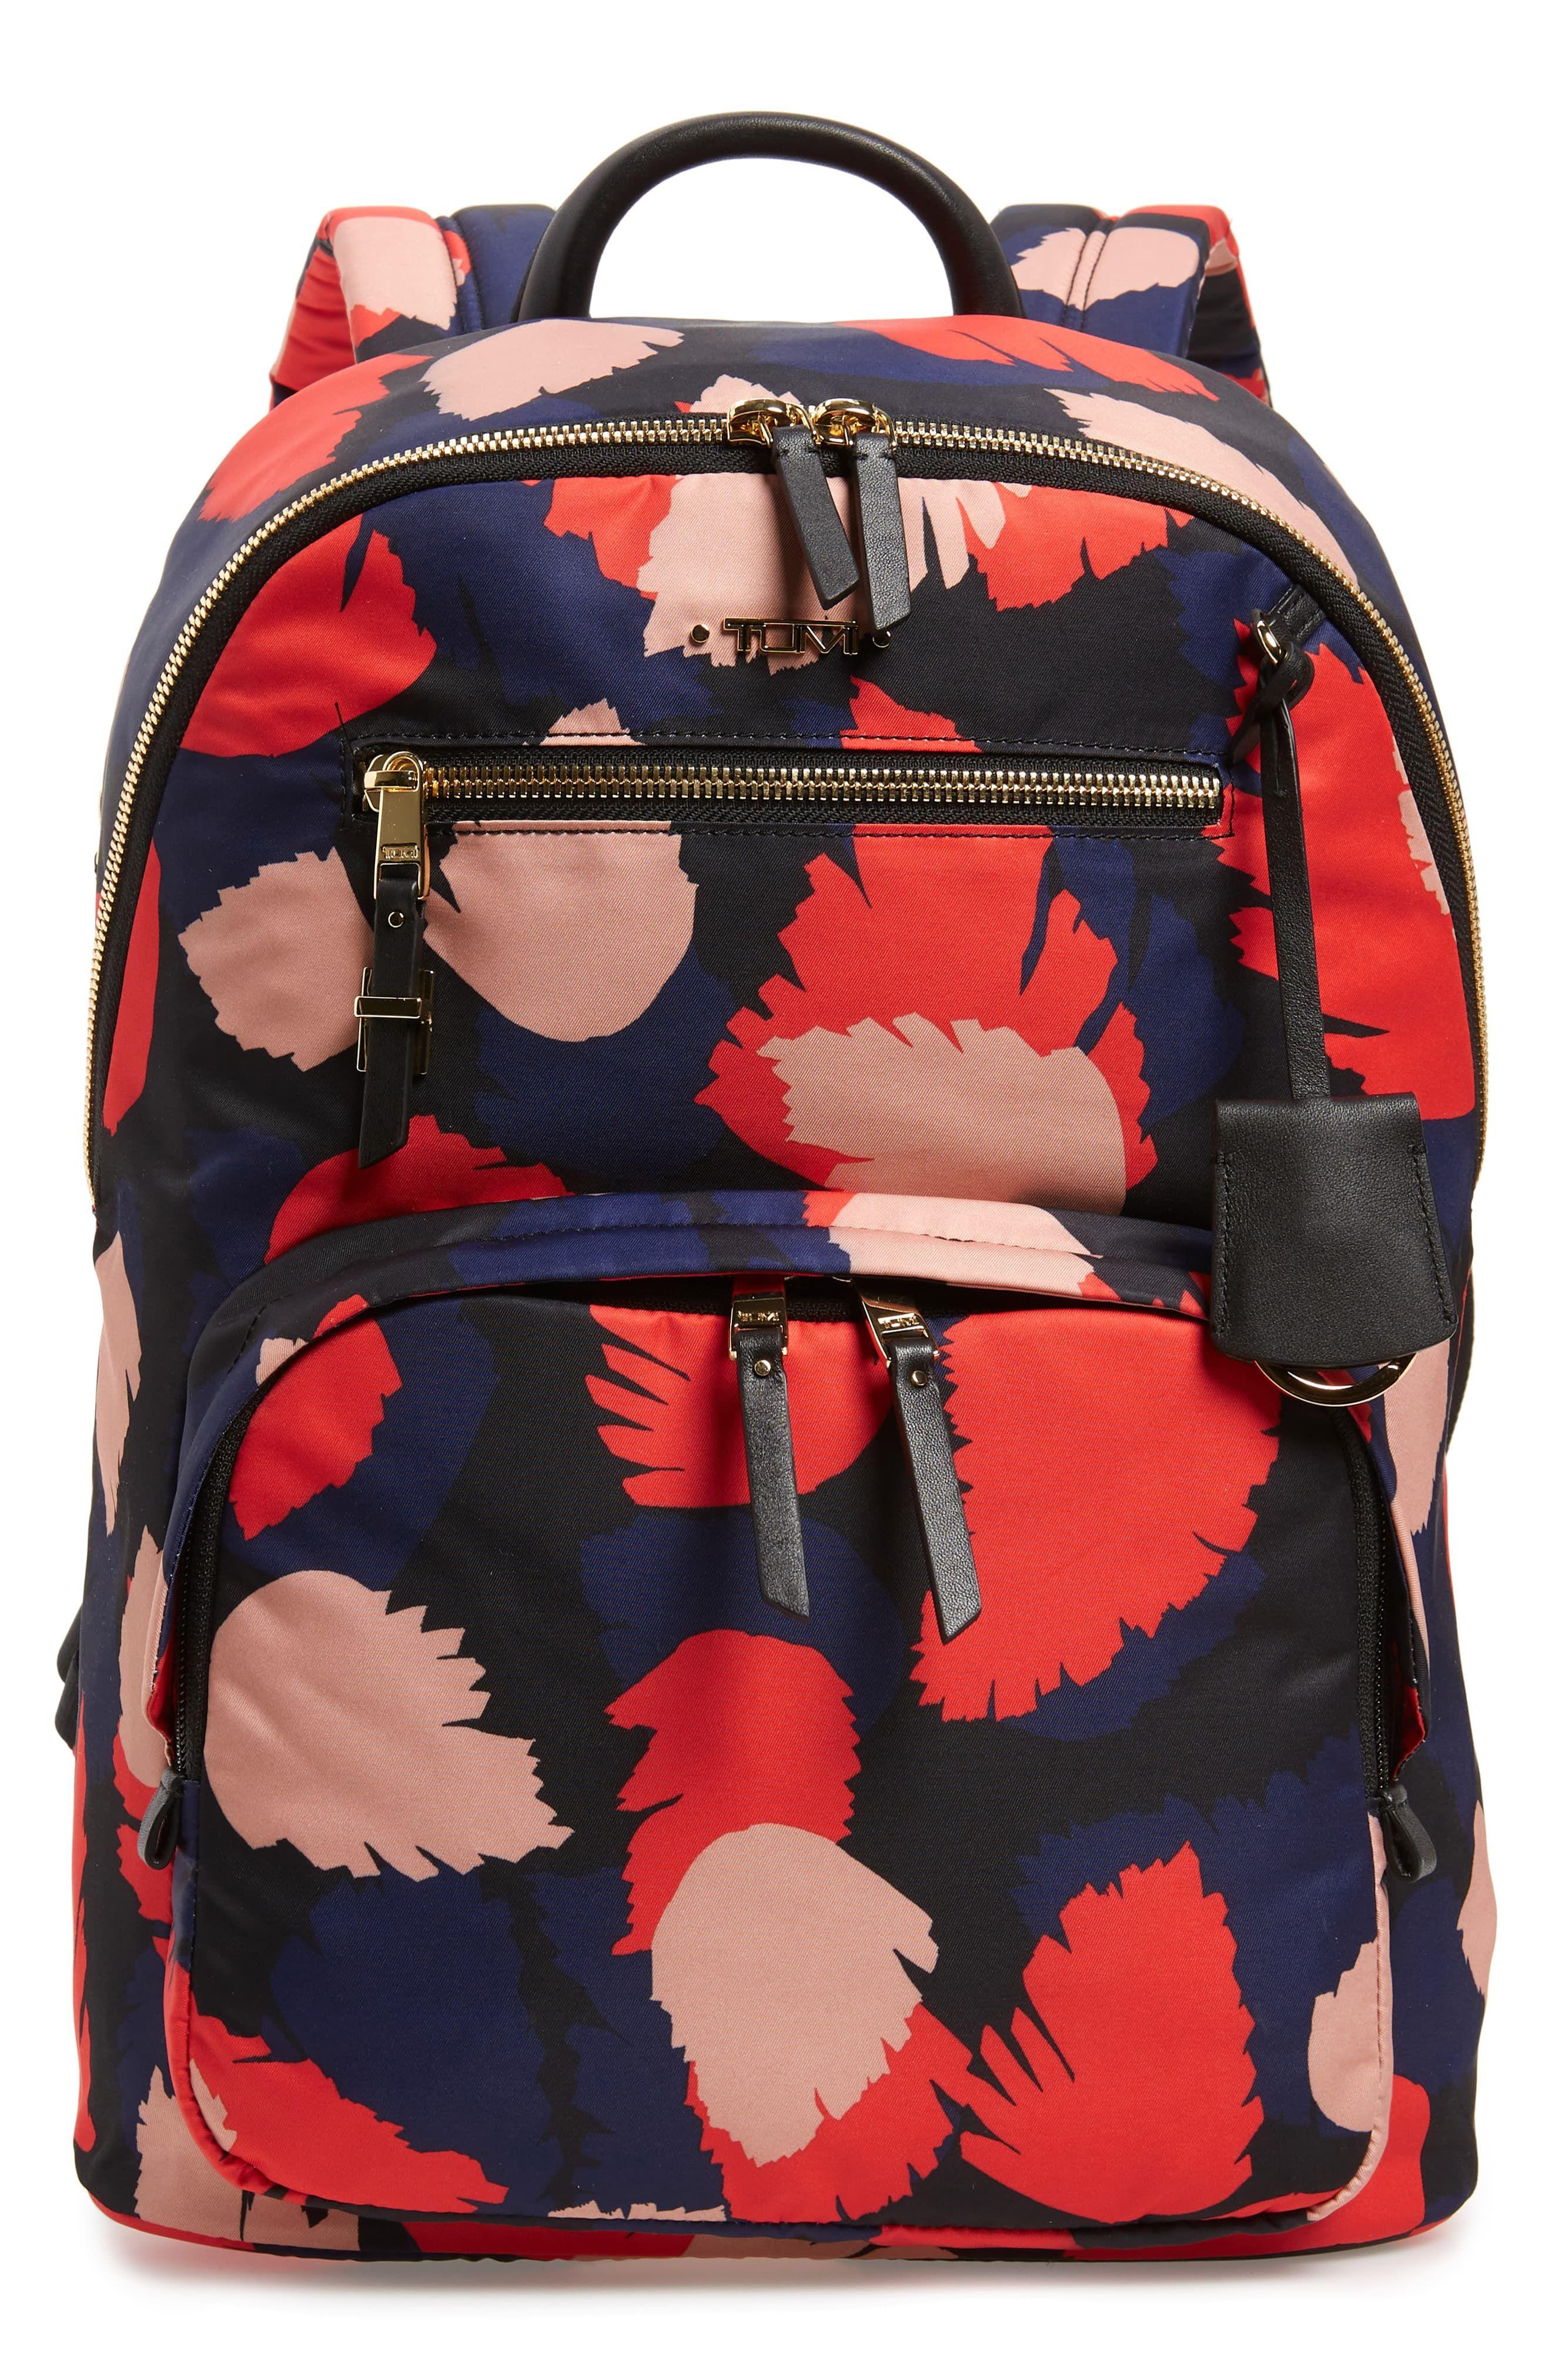 4917838e7fb8 Voyageur Hagen Print Nylon Backpack